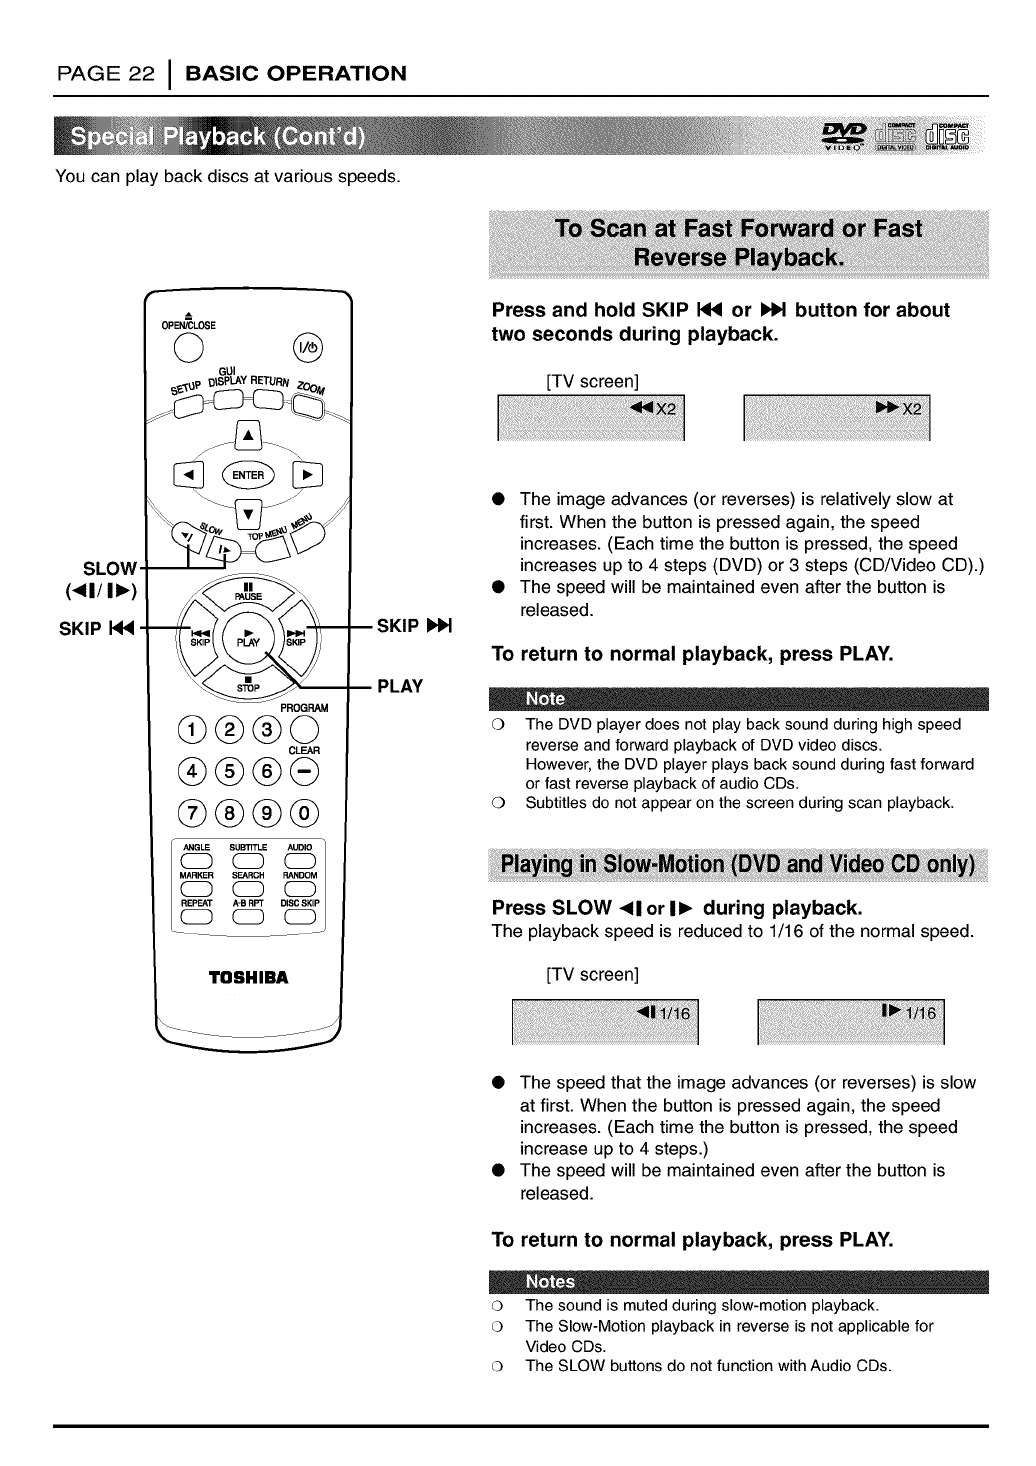 TOSHIBA DVD Systems Manual L0209243